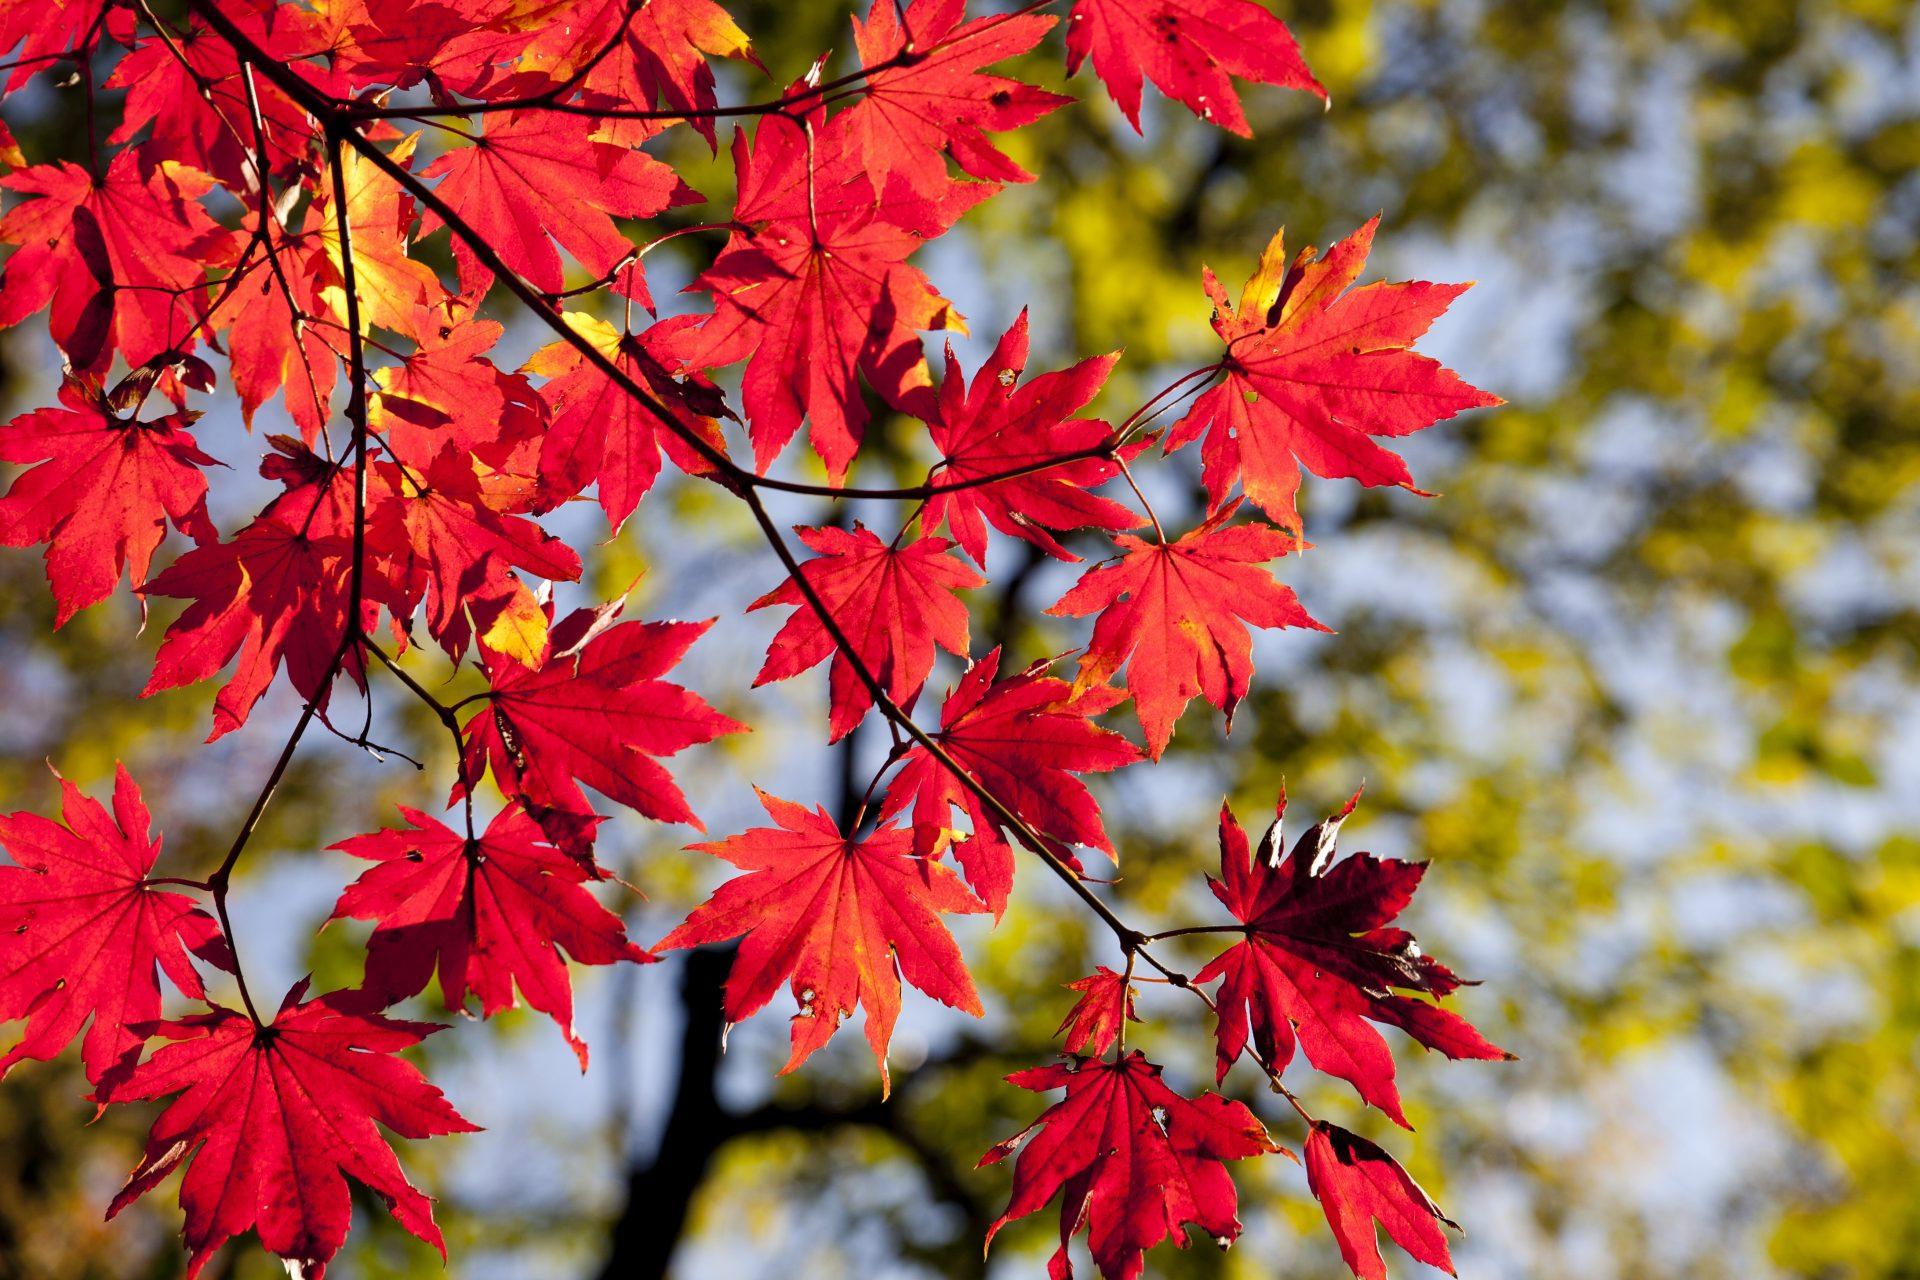 Messehighlights im Herbst